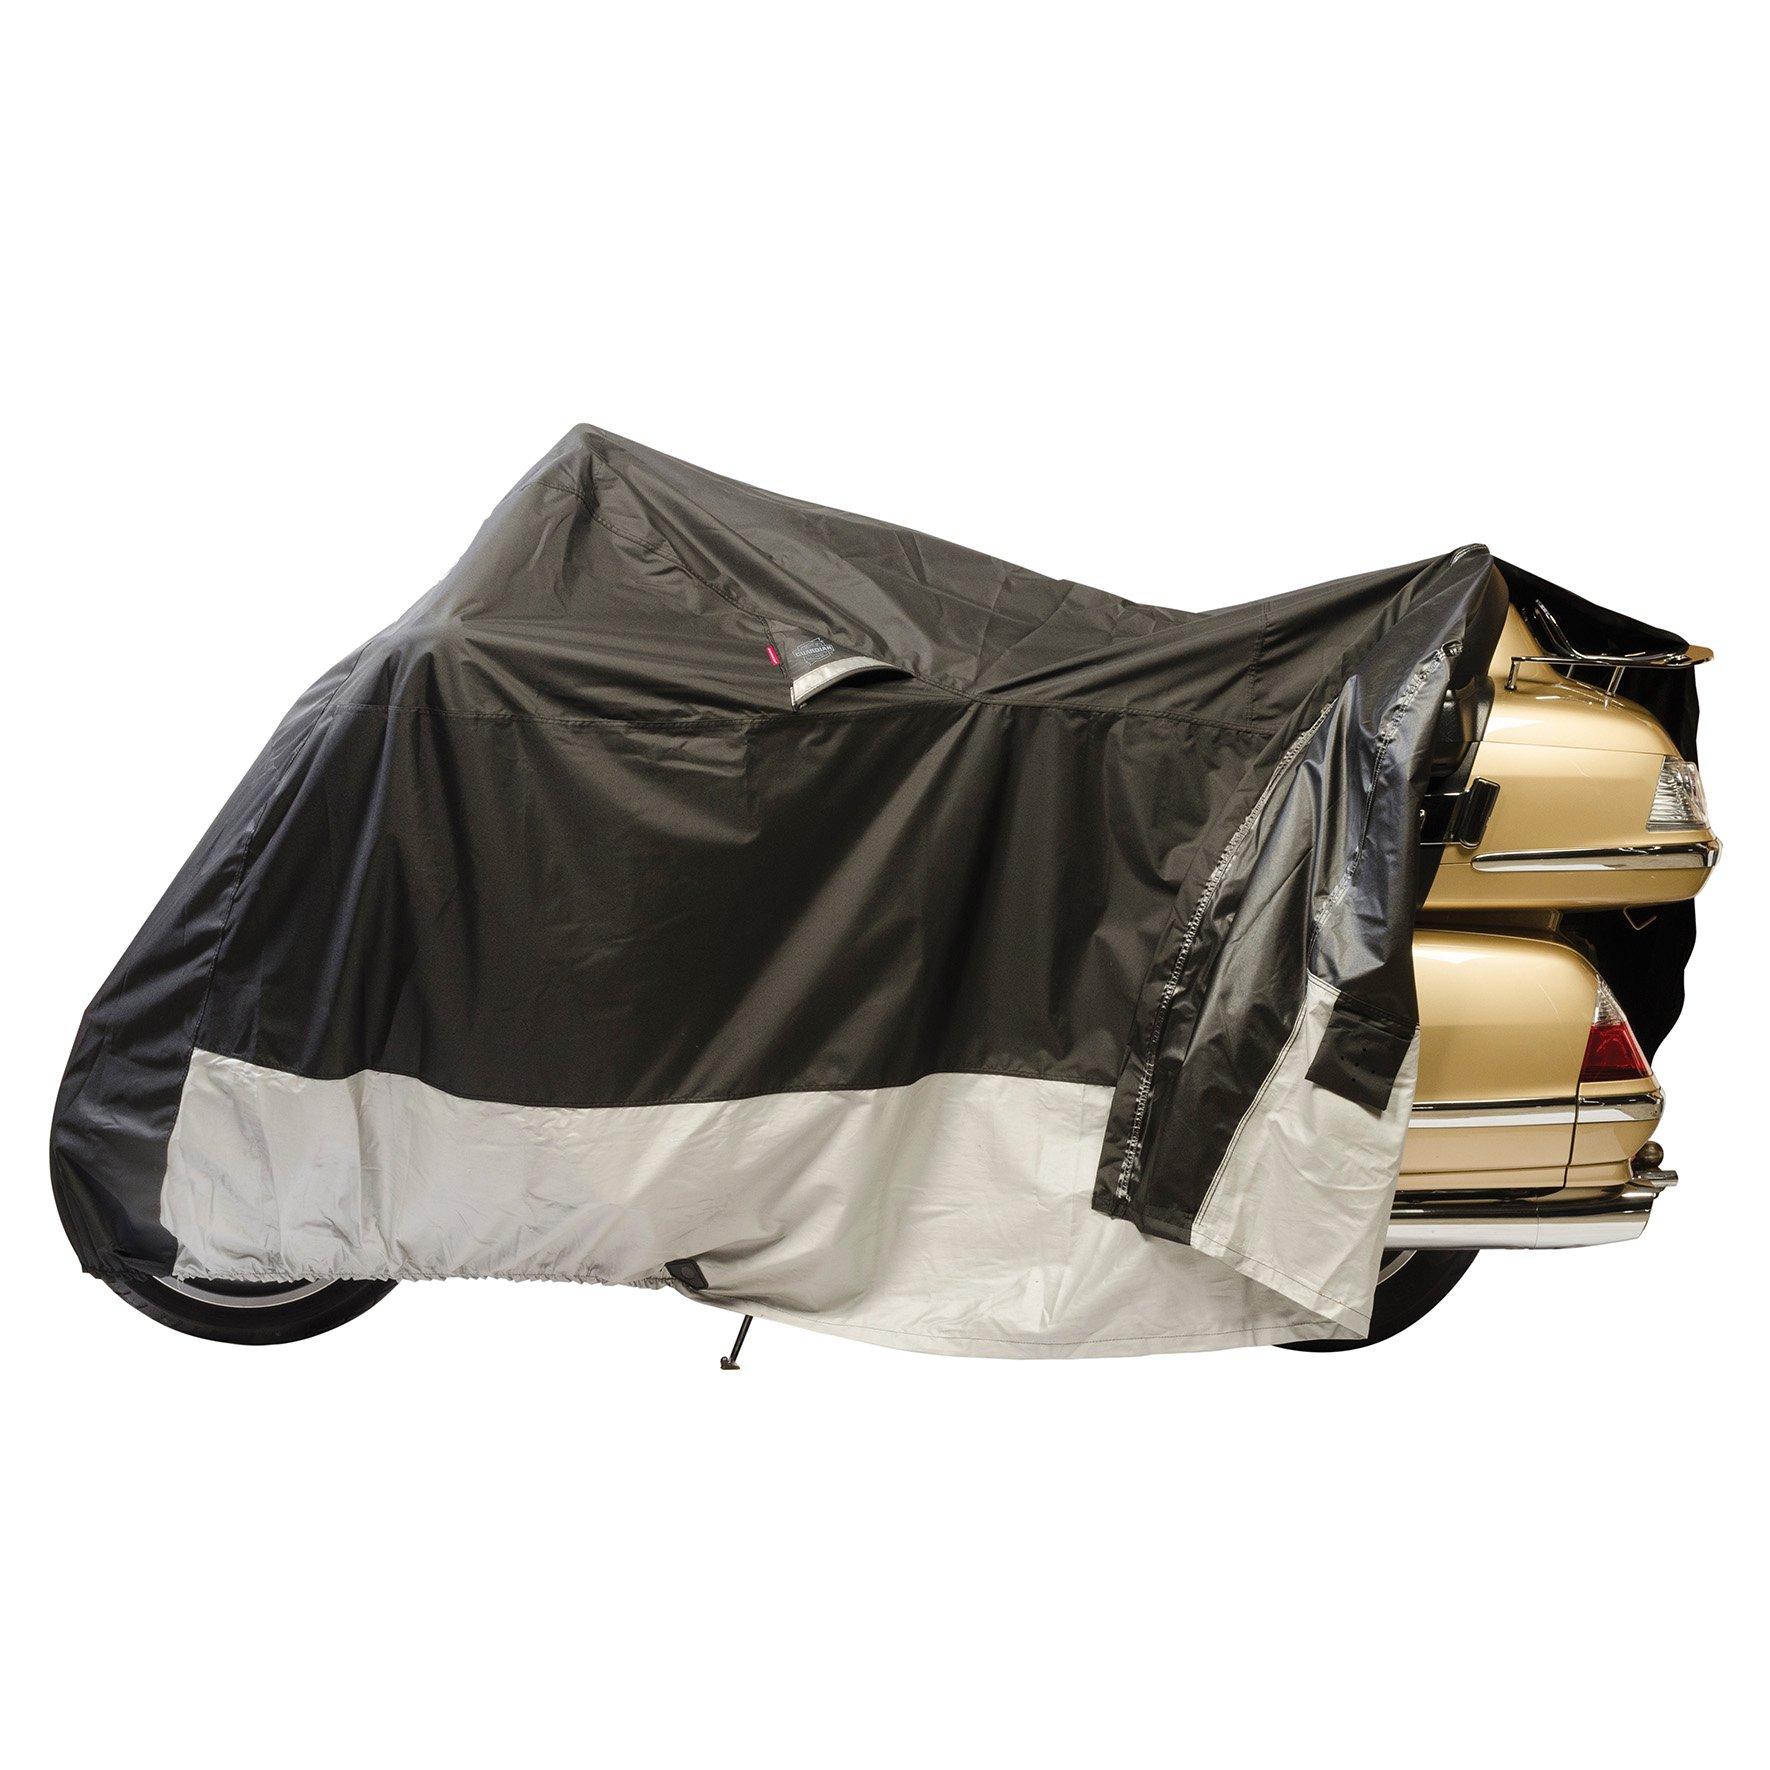 Guardian by Dowco 50020-00 WeatherAll Plus Indoor/Outdoor Waterproof Motorcycle Cover, EZ Zip: Black, X-Large